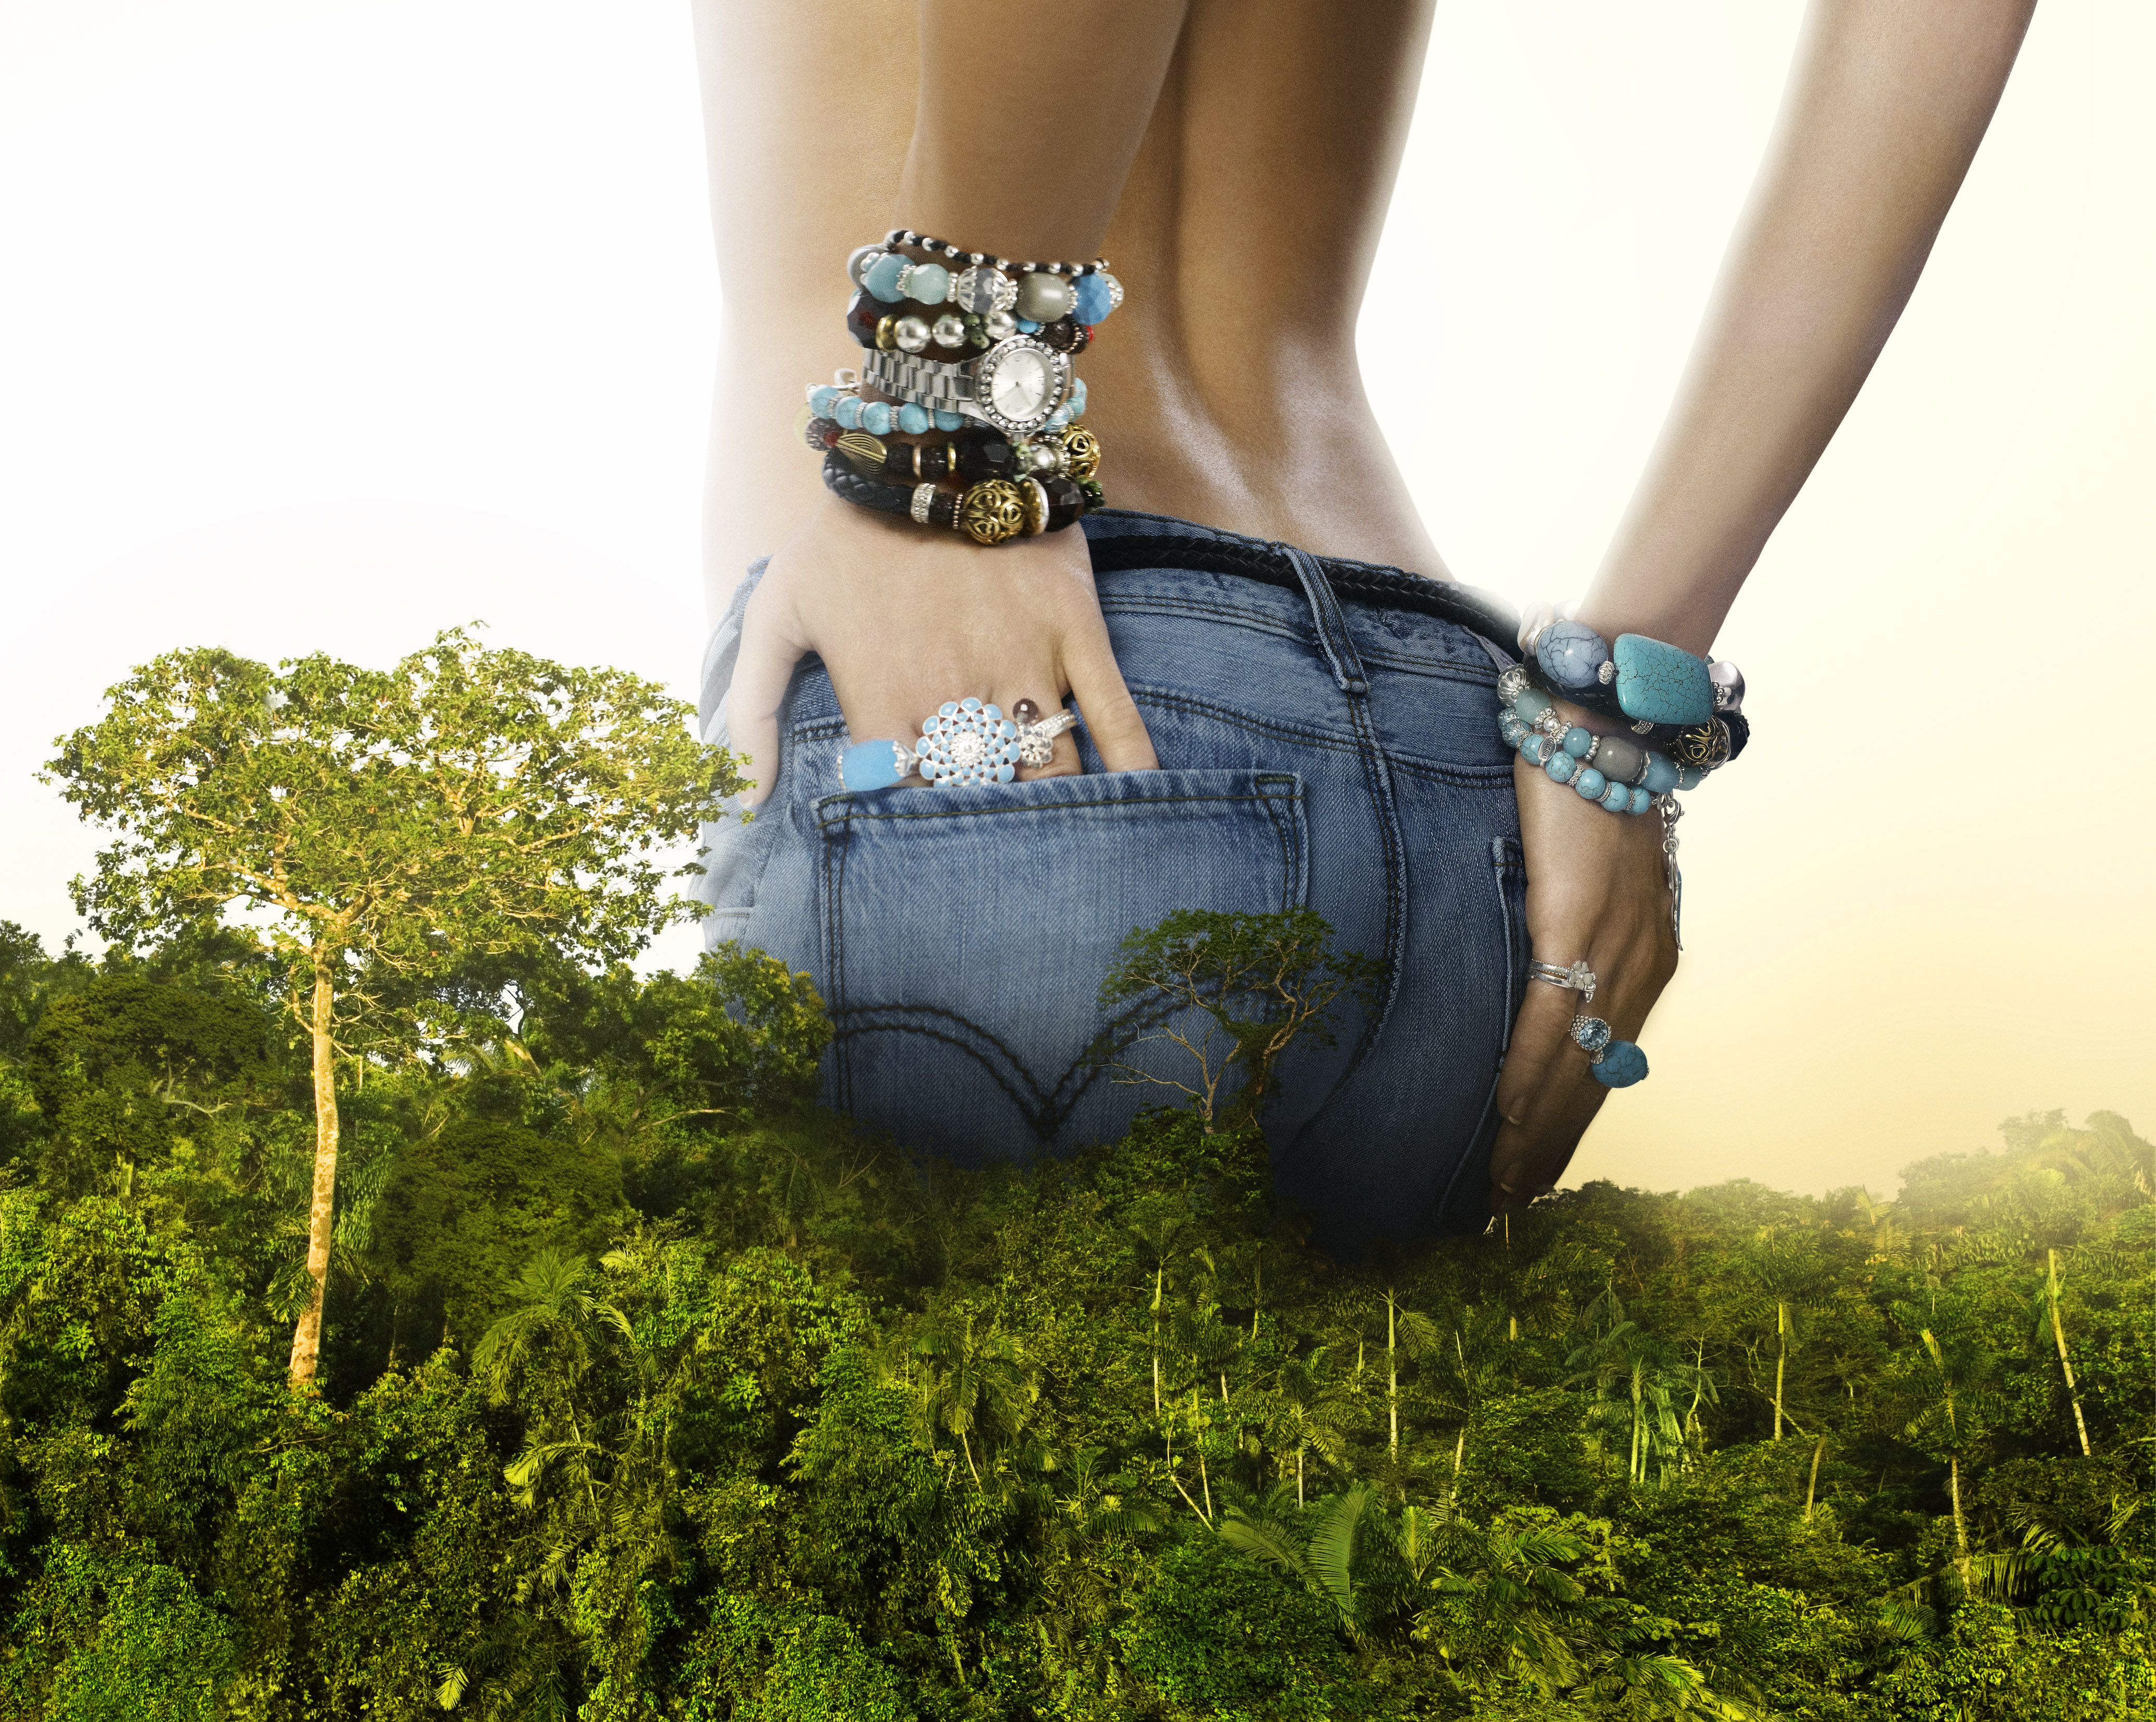 giantess booru (image 66865: artistic back blonde butt giantess